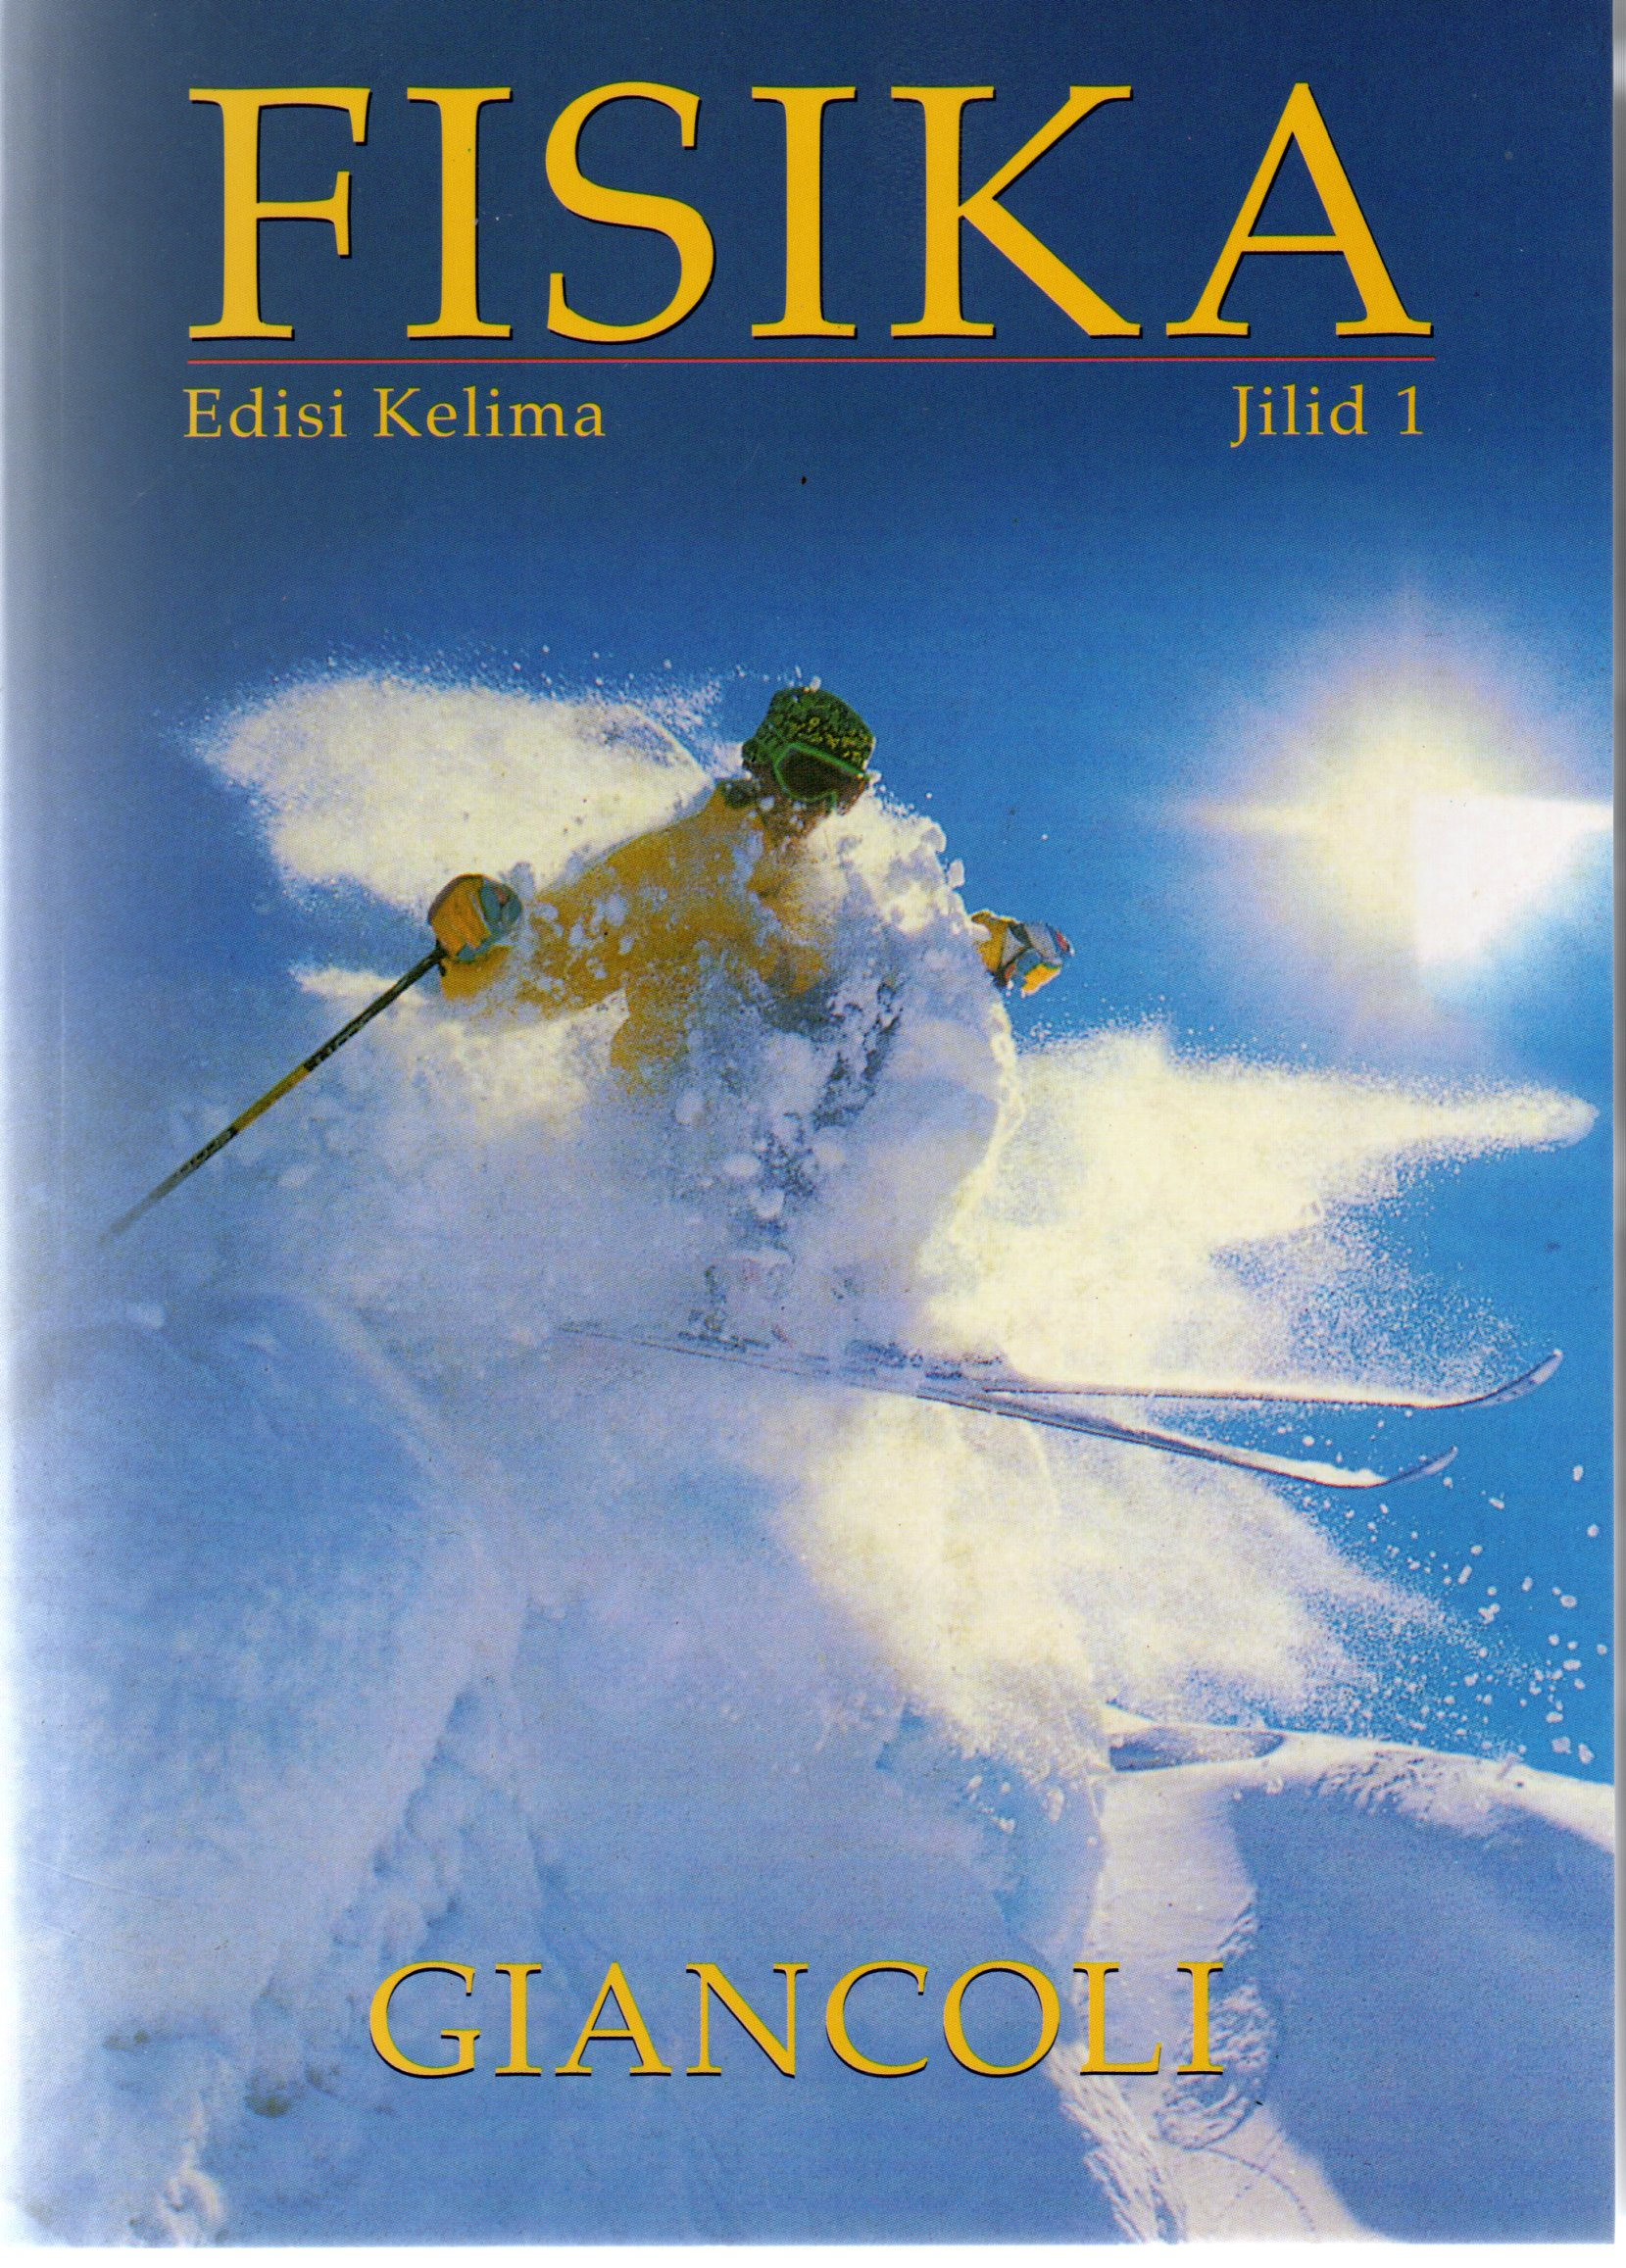 Fisika edisi 5 jilid 1